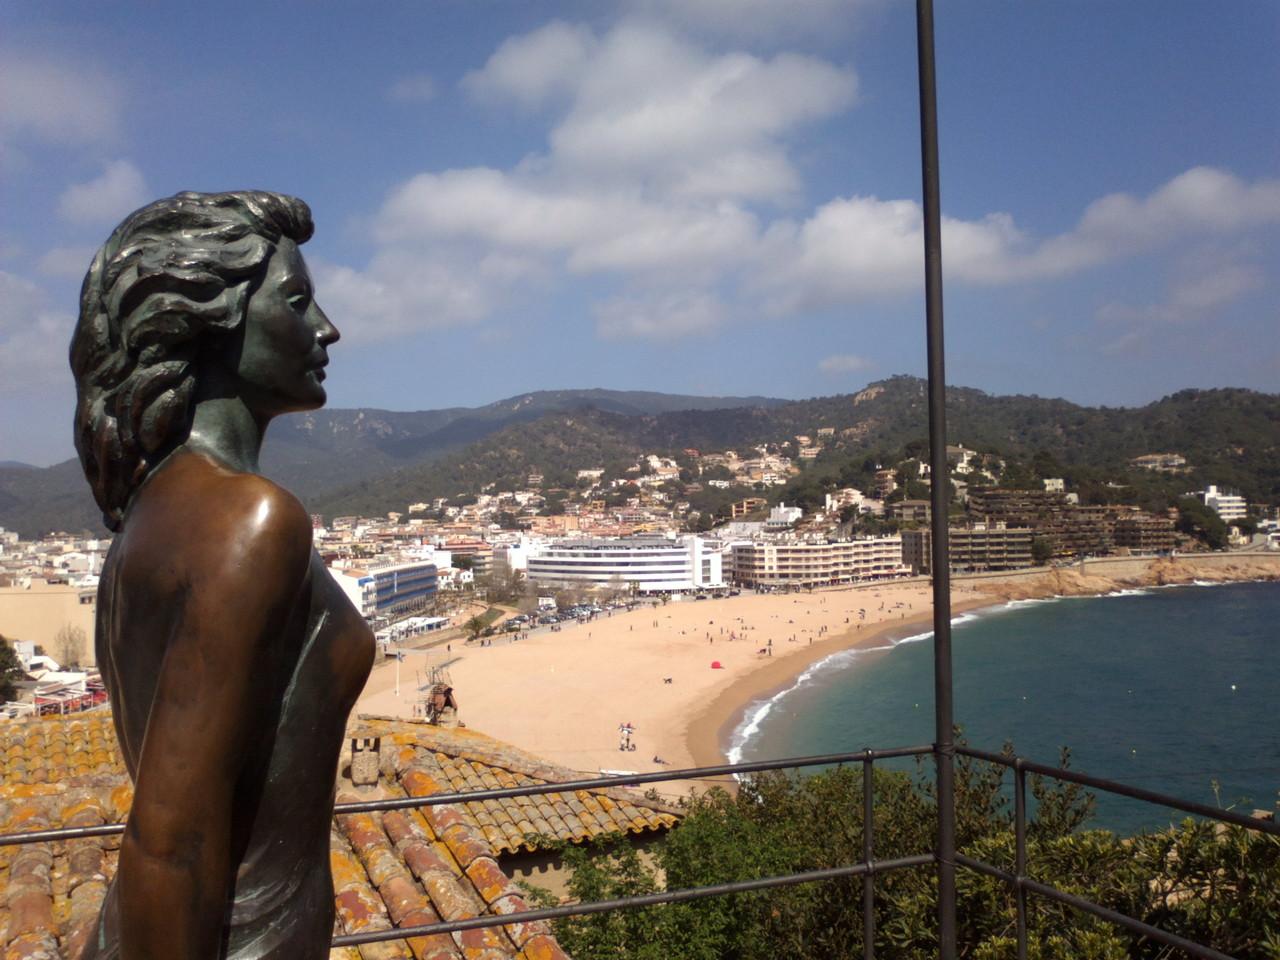 Statue of Ava Gardner life-size in Tossa